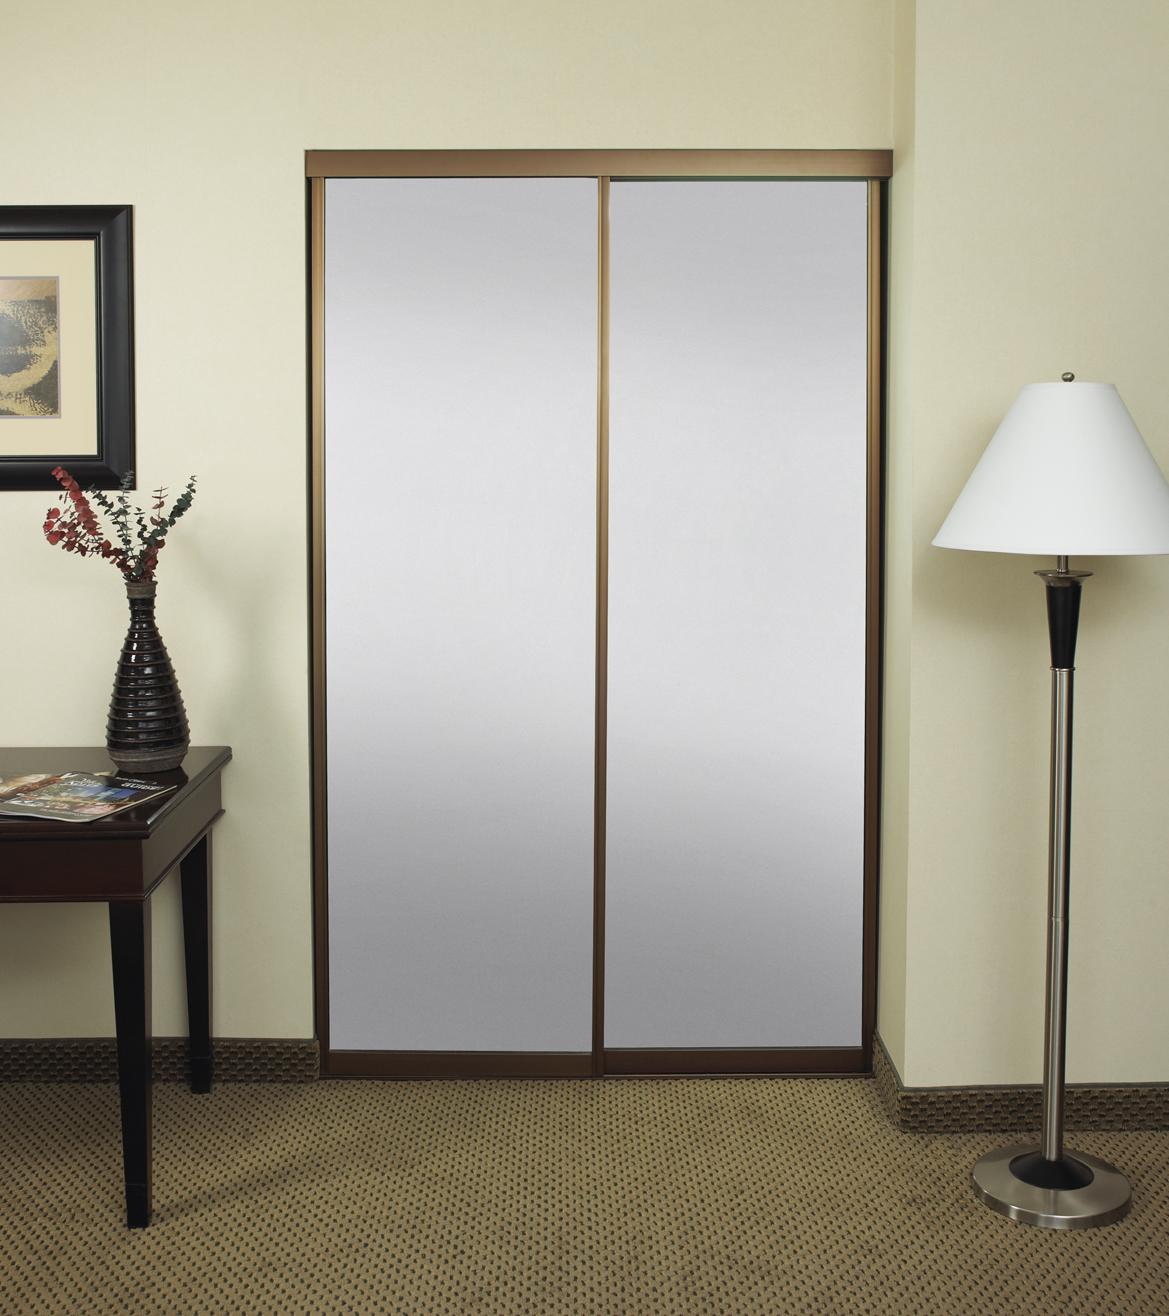 Stylmark Wardrobe Doors - Frosted Panels.jpg